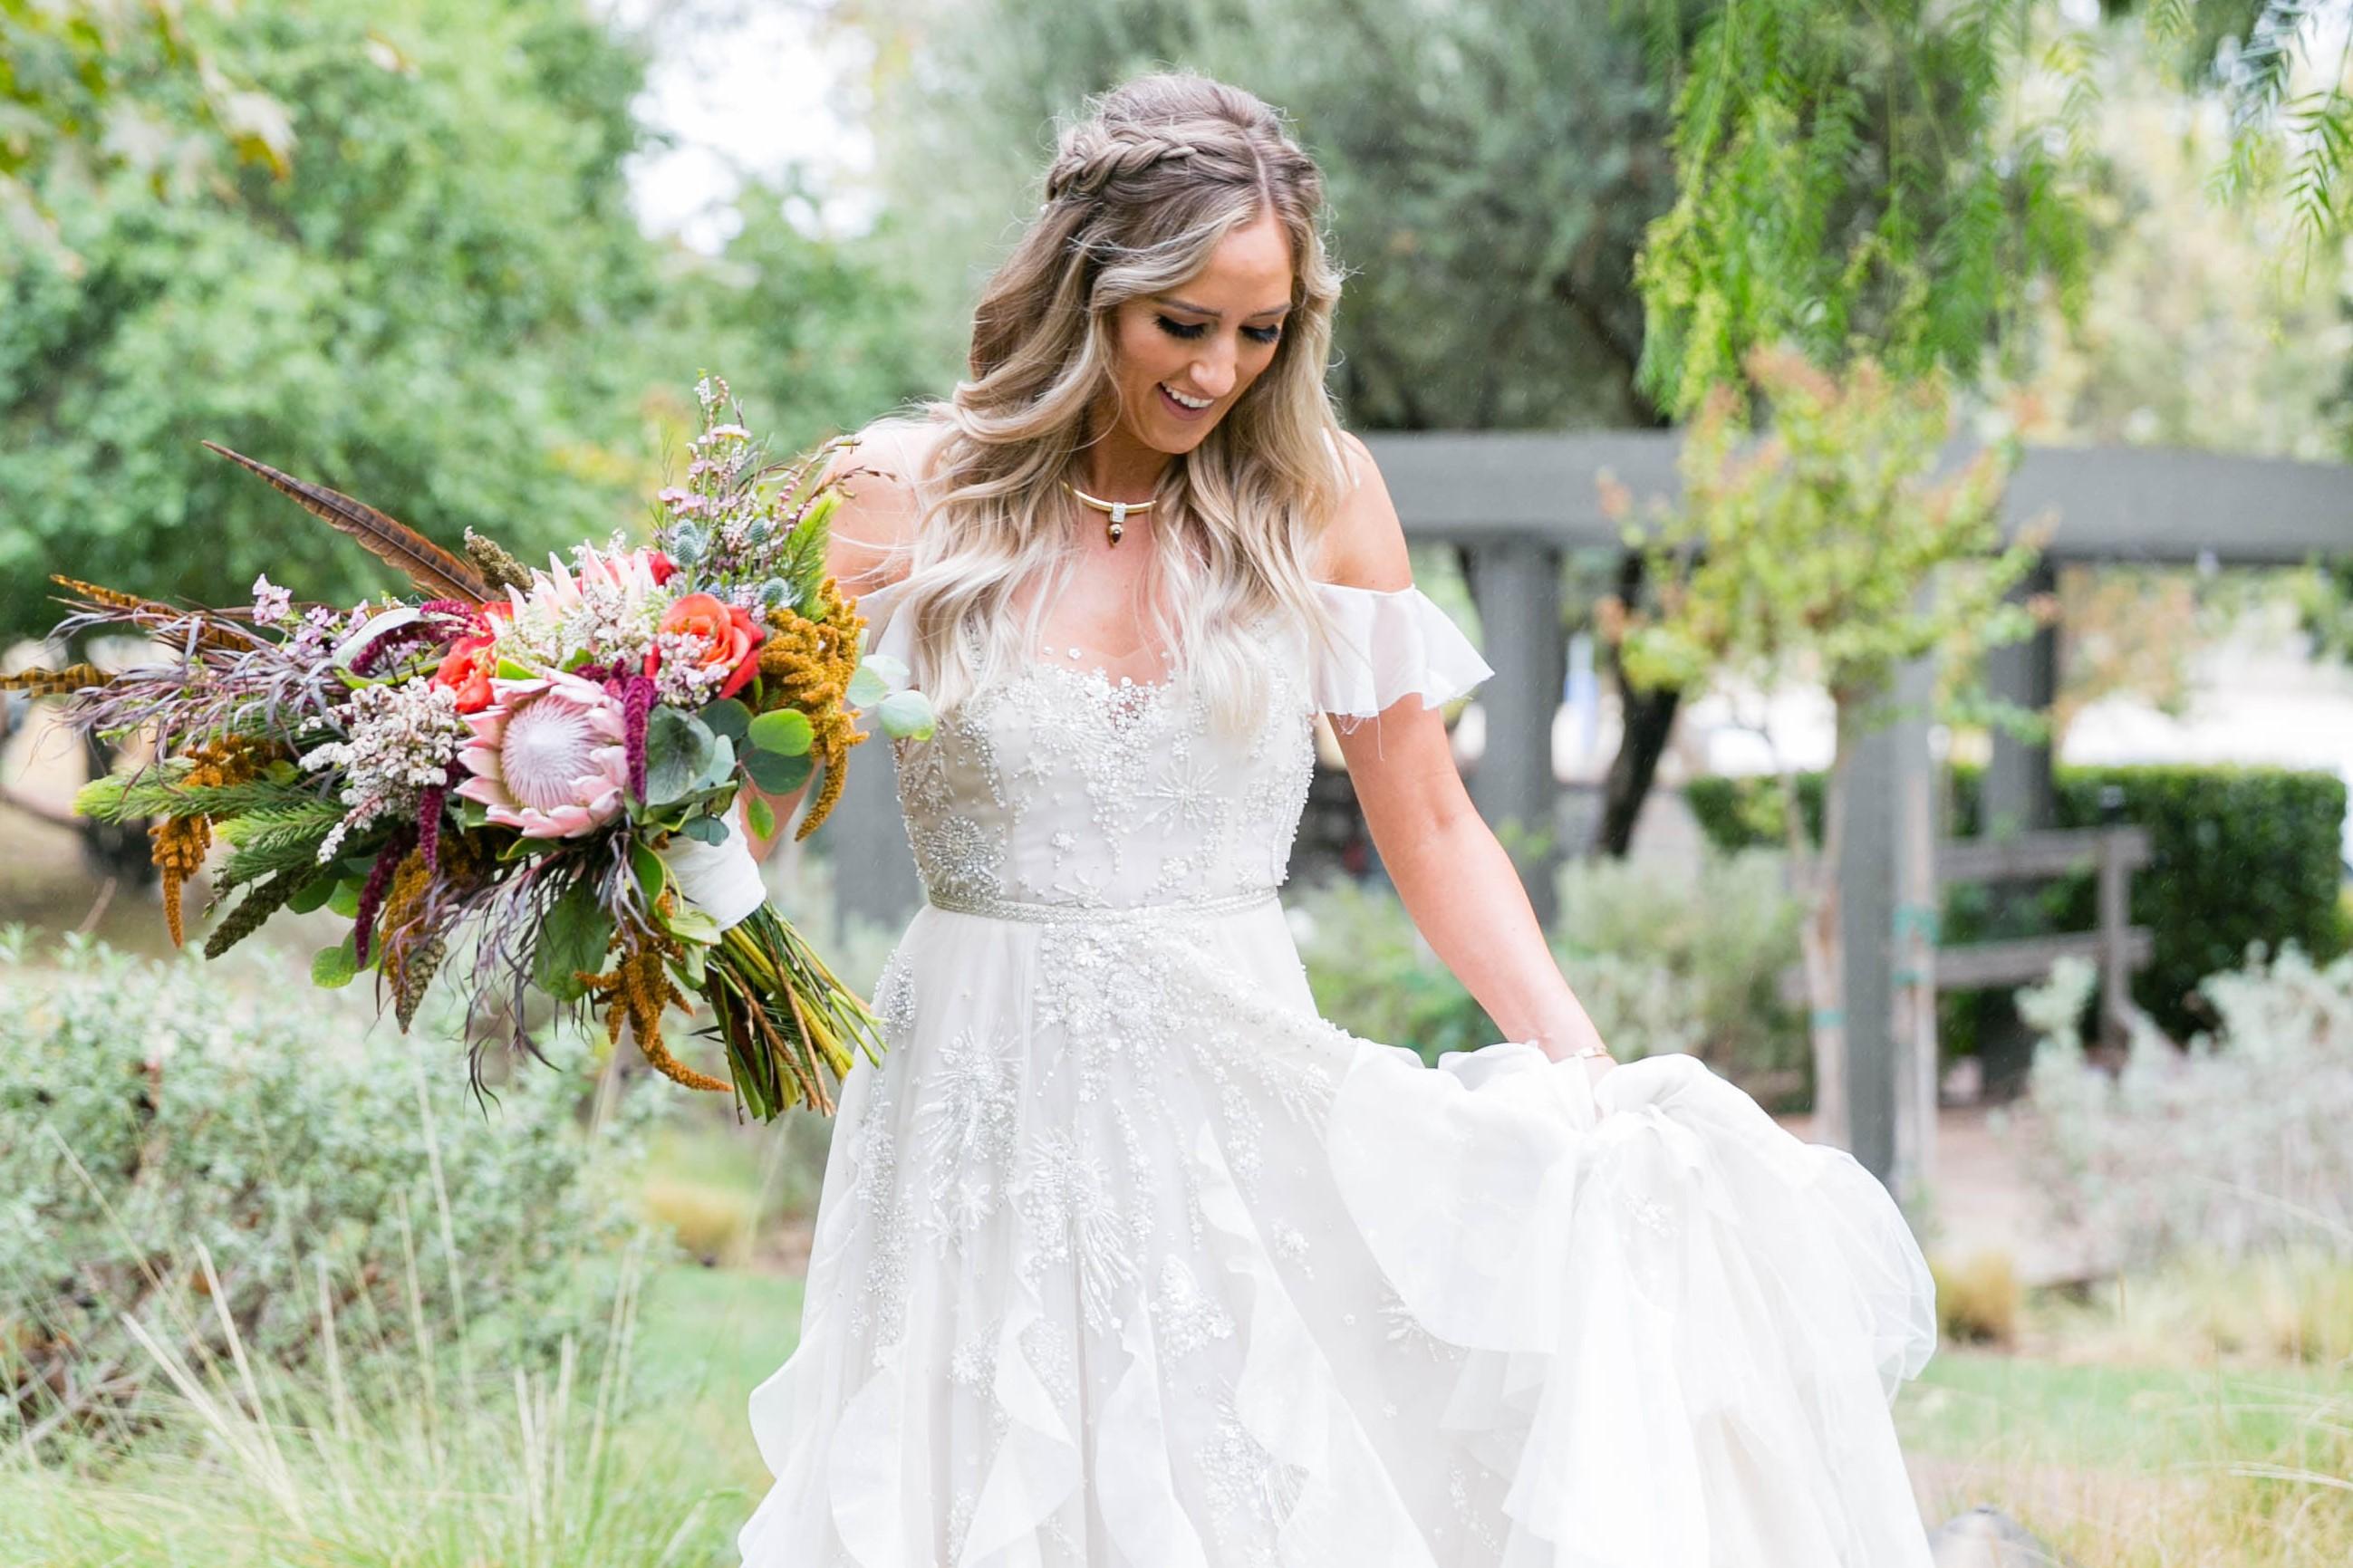 Affordable Wedding Dress Alternatives